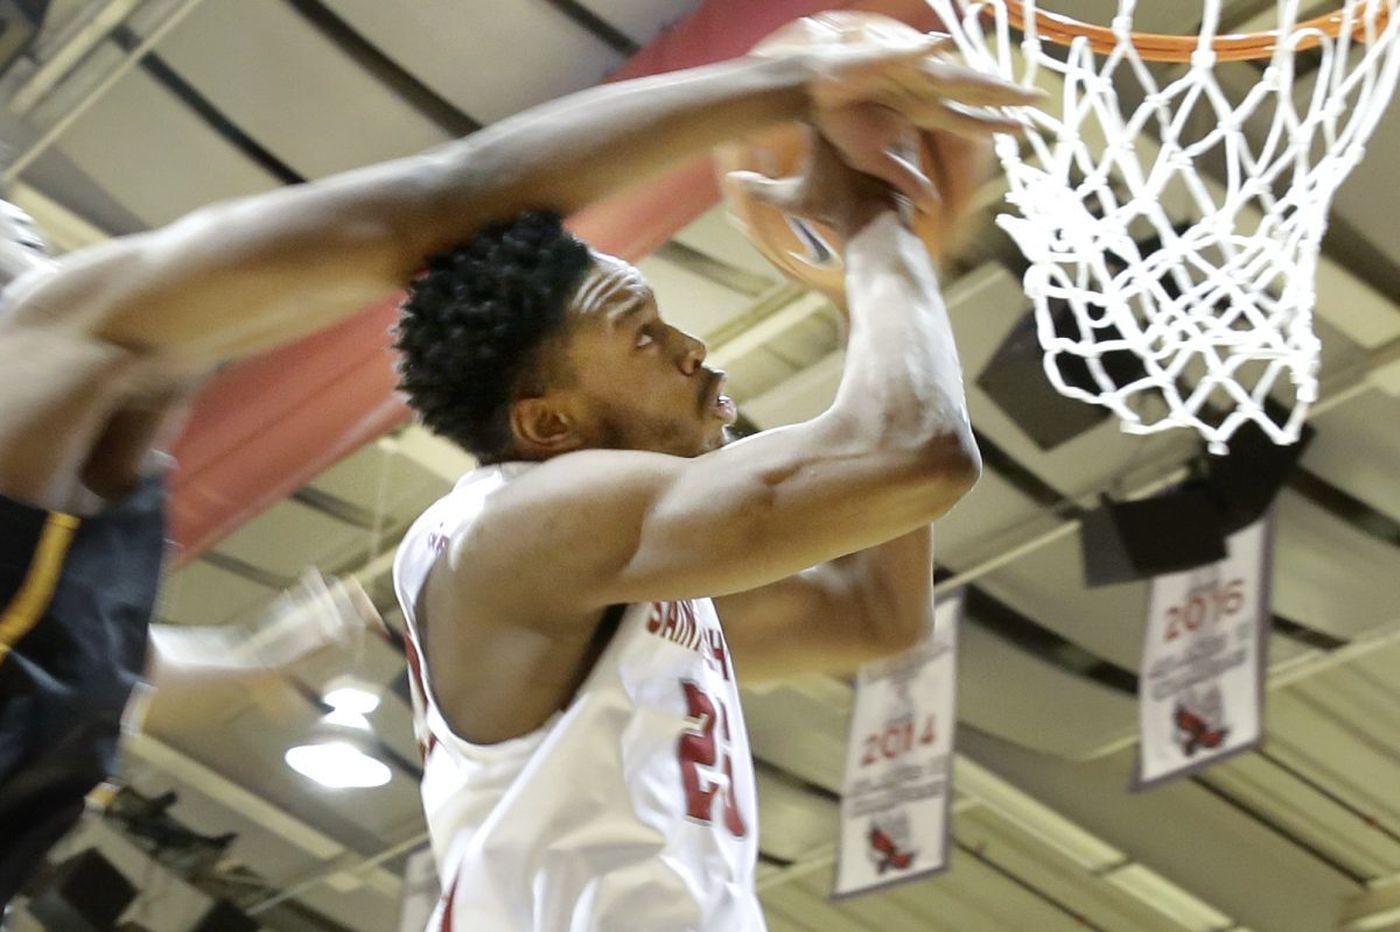 St. Joseph's looks to rebound against St. Louis